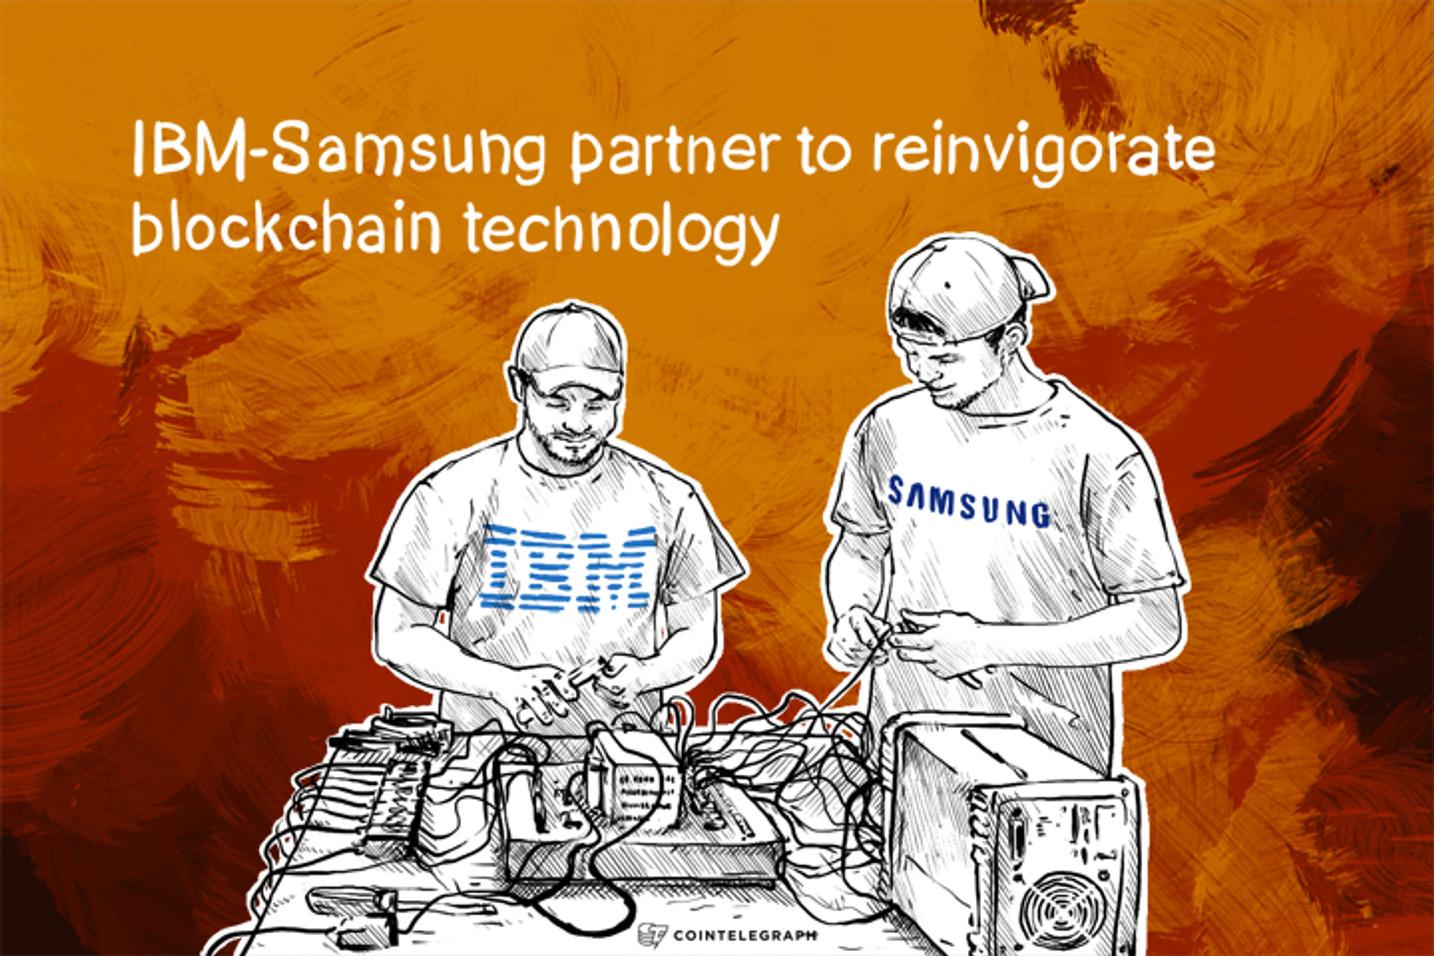 IBM-Samsung partner to reinvigorate blockchain technology